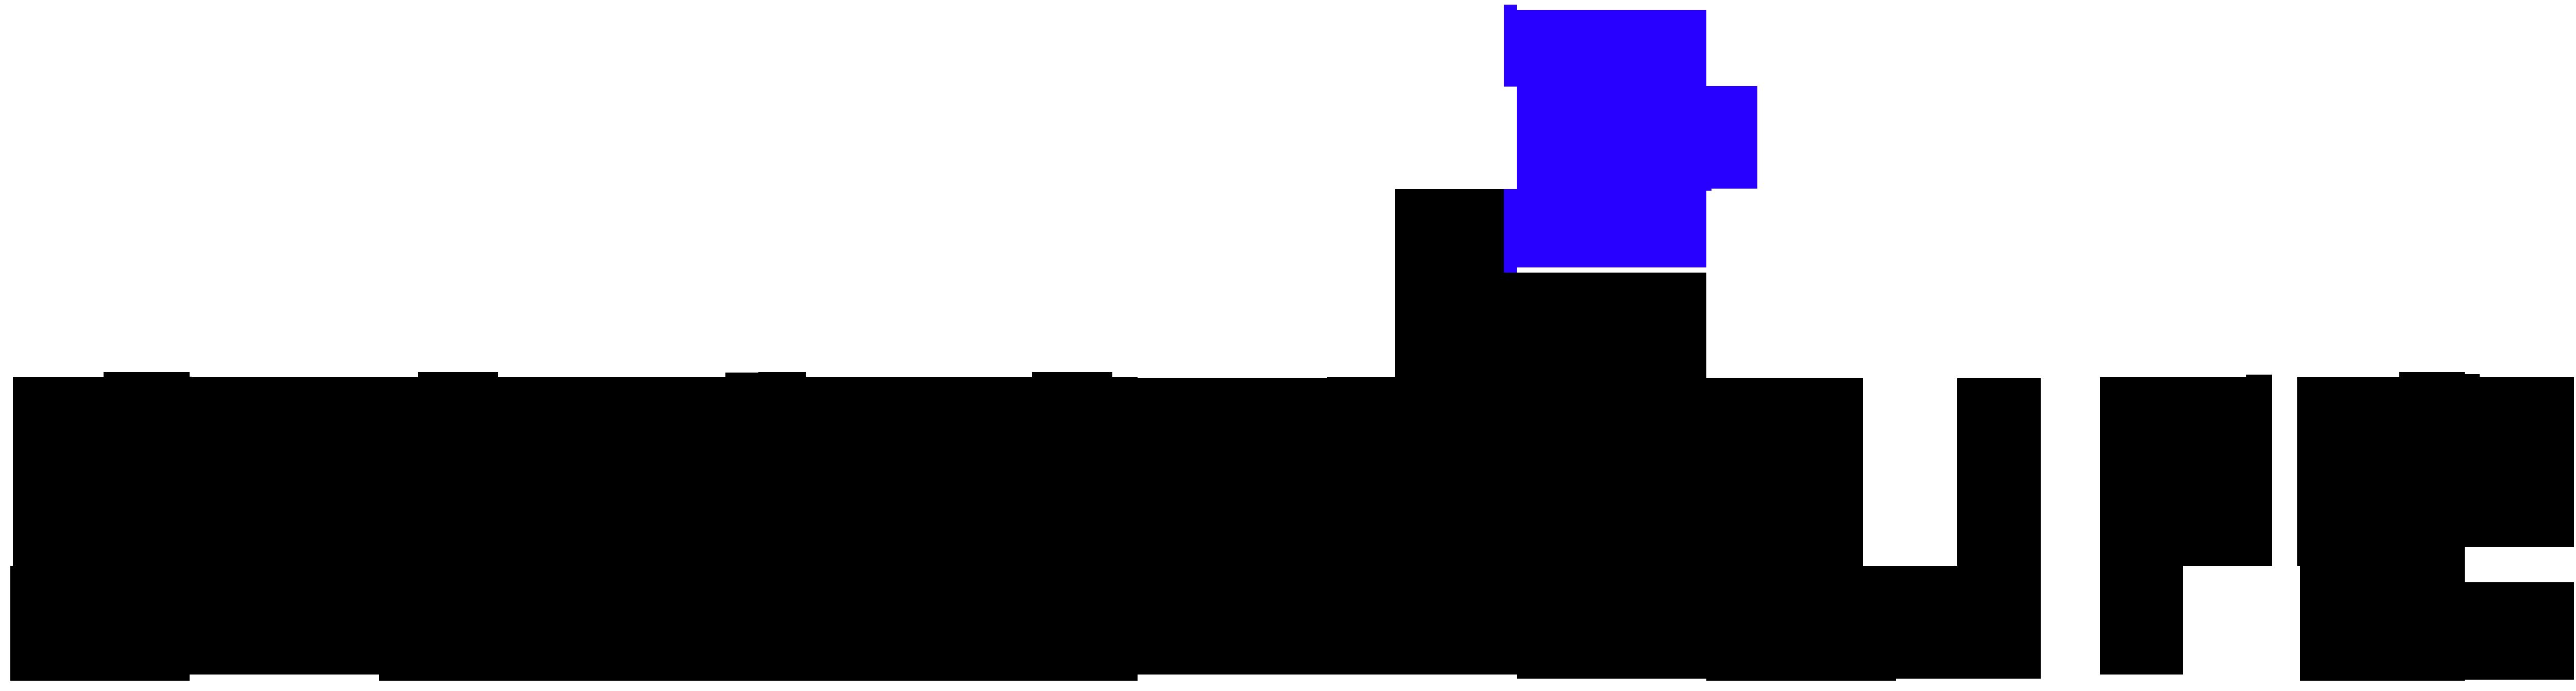 Accenture_Updated